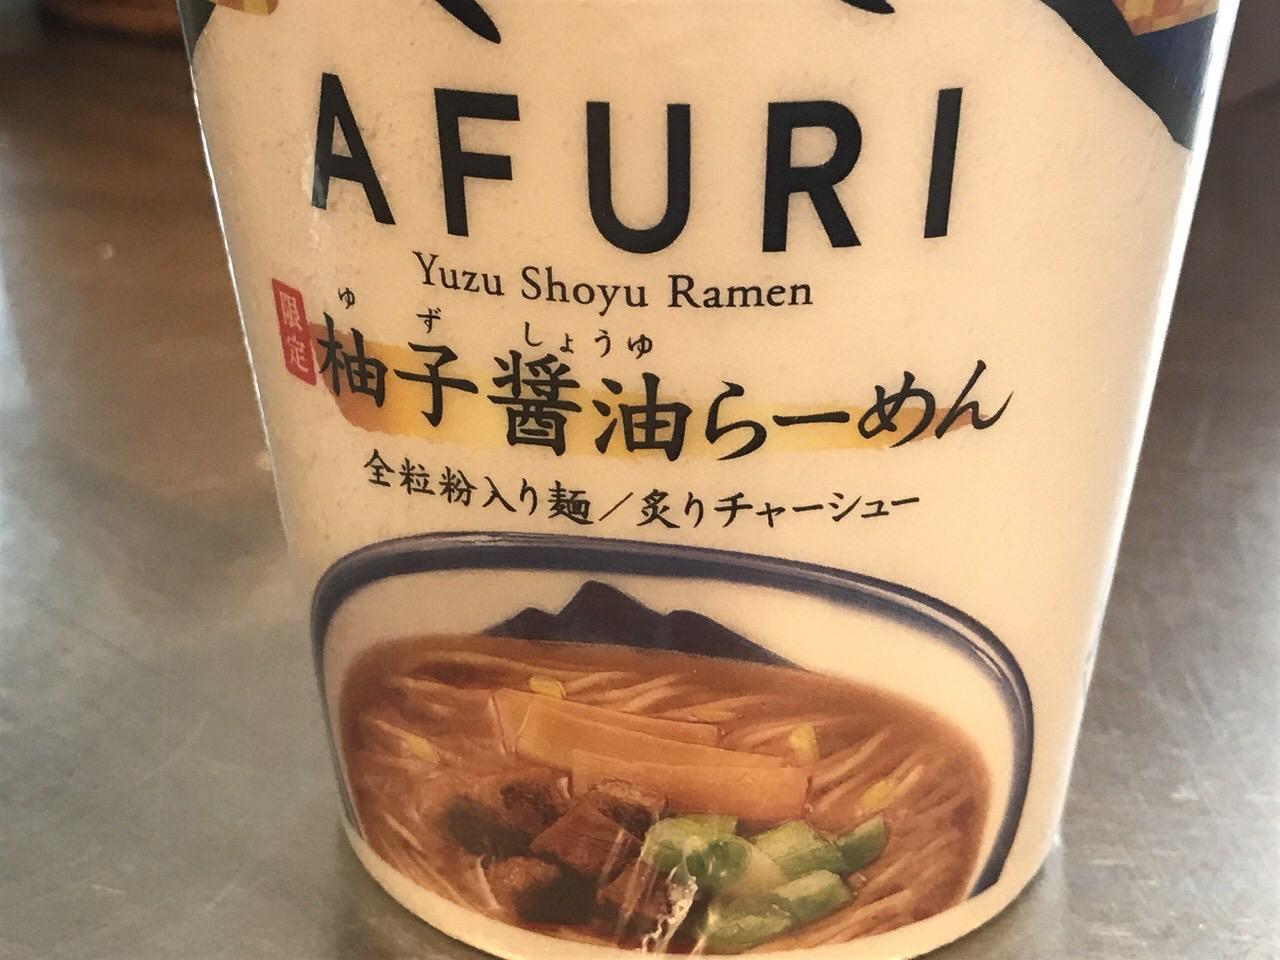 「AFURI 限定柚子醤油らーめん」やっぱり麺が美味かった